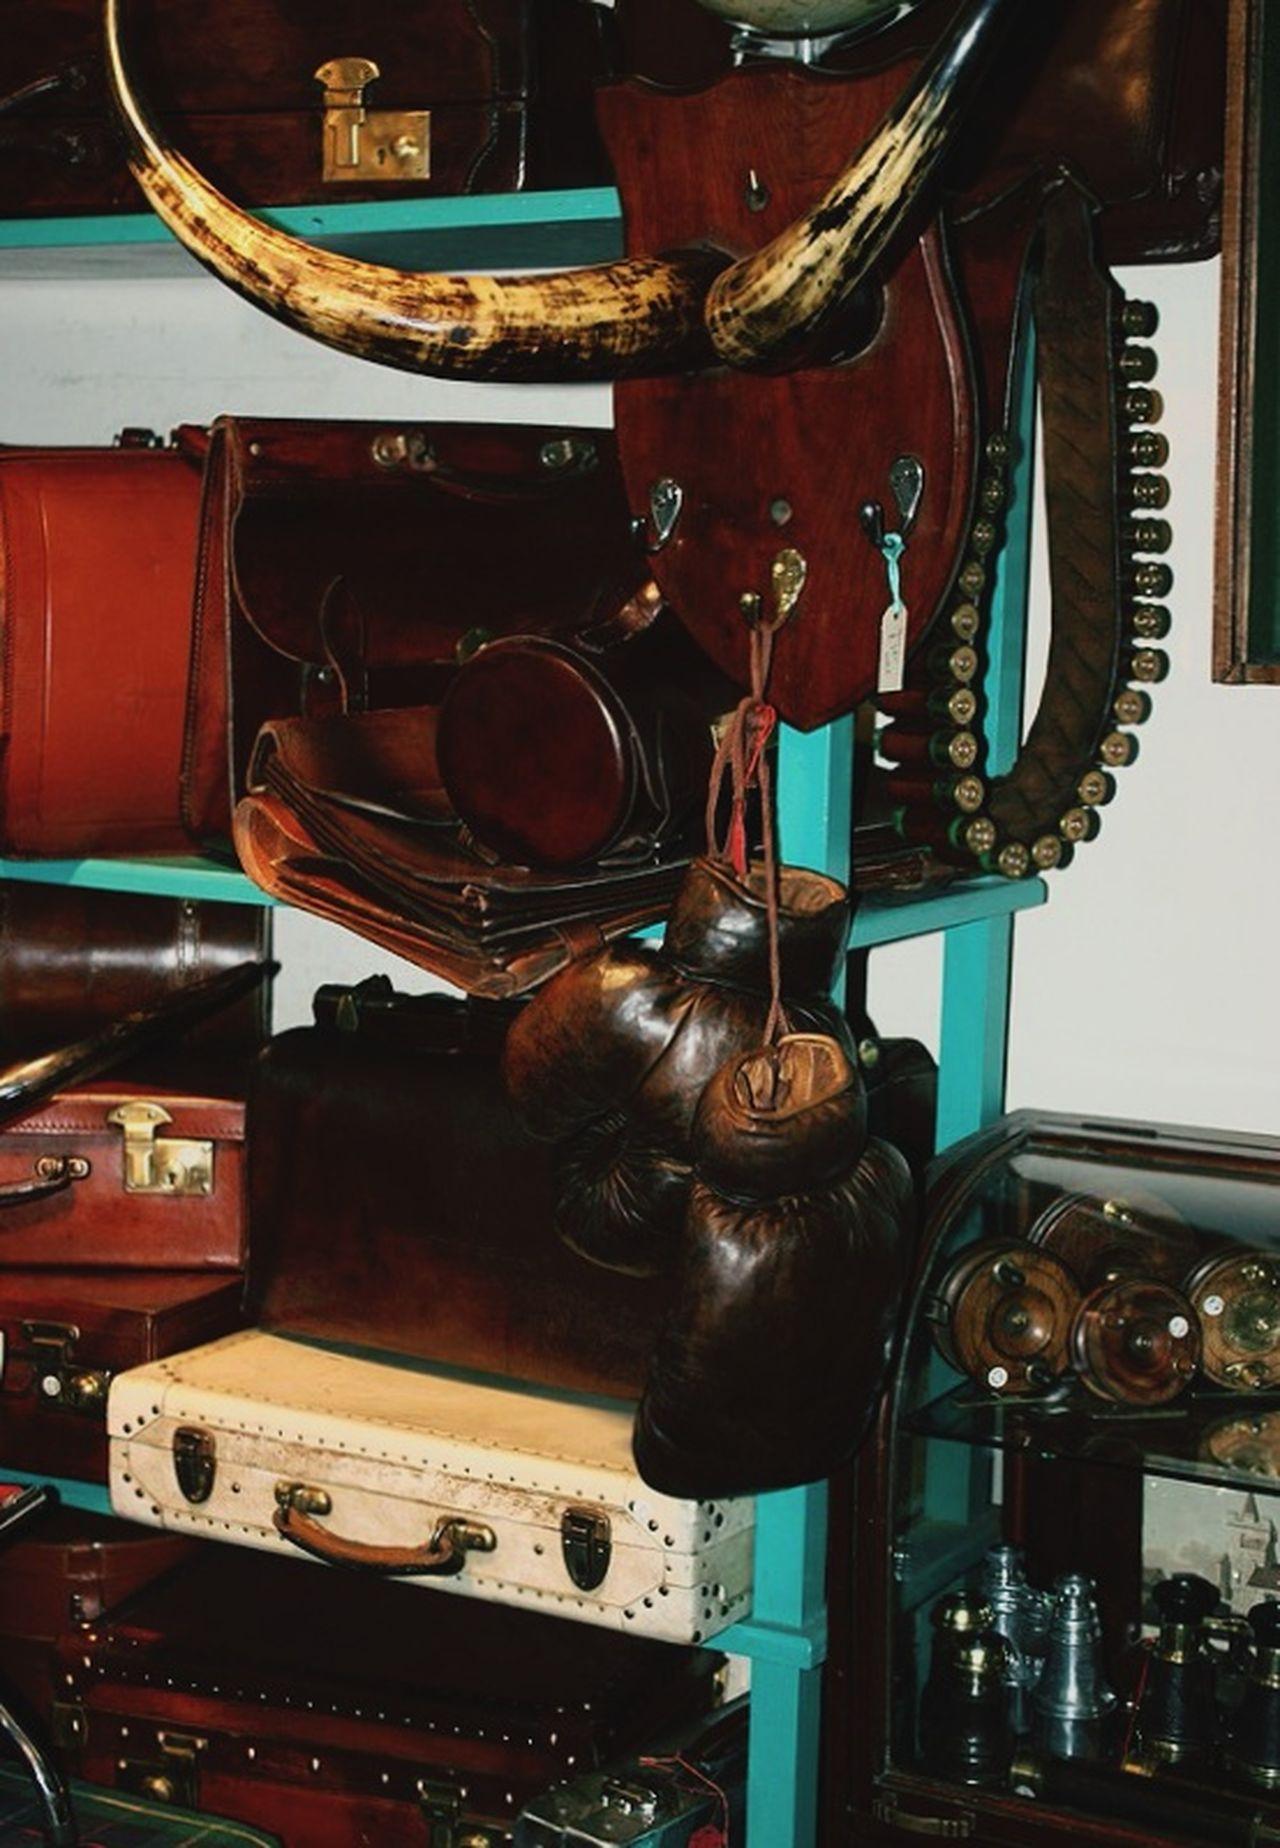 Vintage Boxeglovesvintage Boxe Boxevintage Vintagegloves Gloves Antiques Antique Antiquity Vintage Shopping